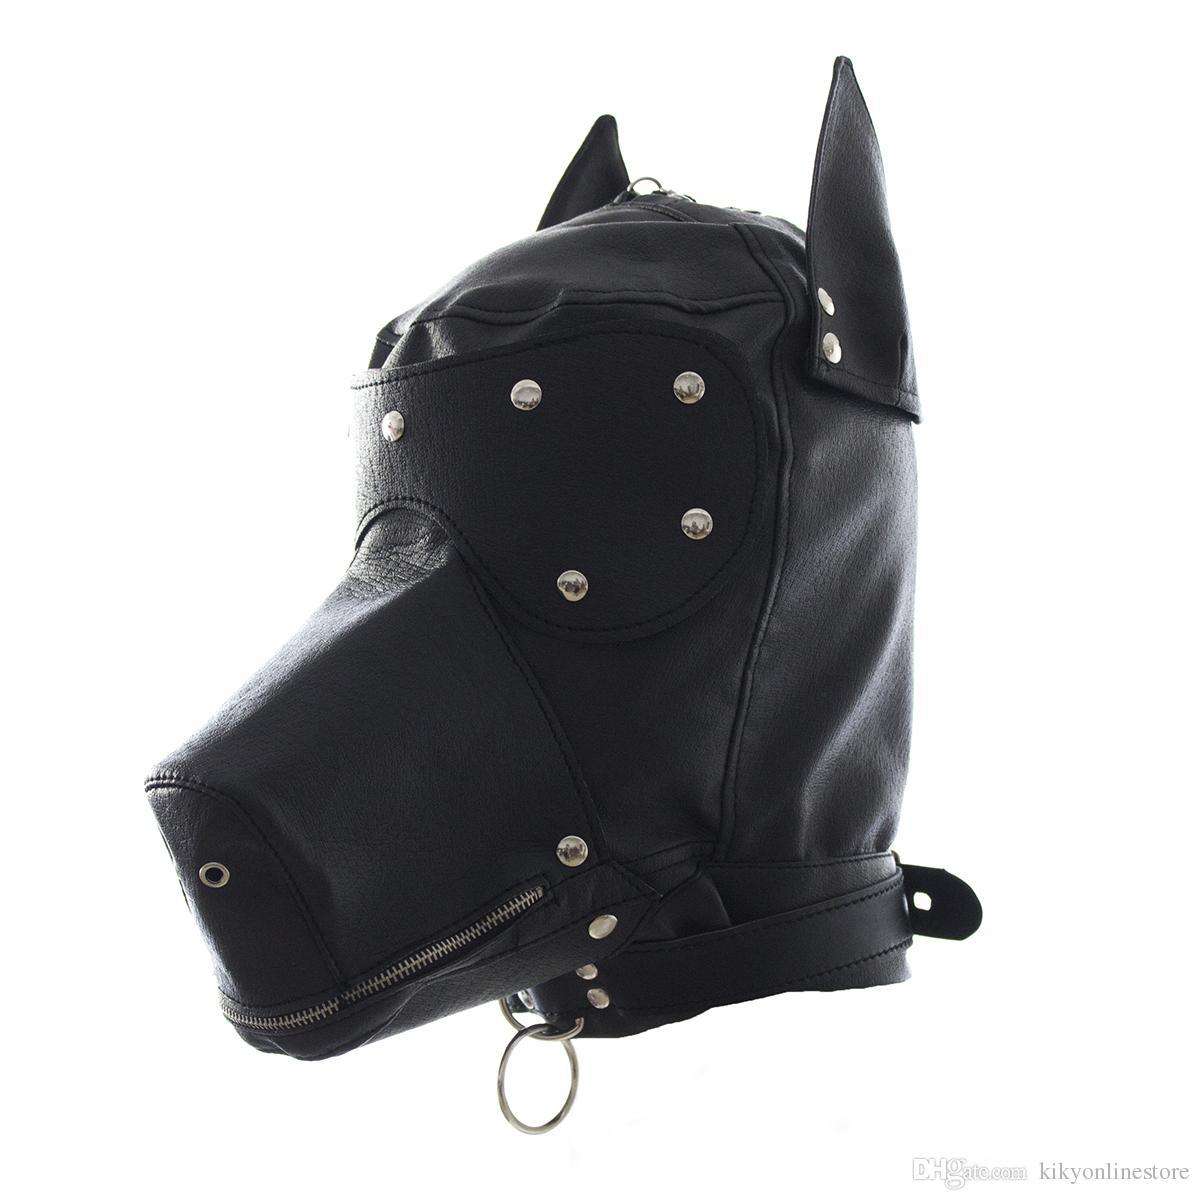 Fetish PU Leather SM Hood Dog Mask Head Harness Sex Slave Collar Leash Mouth Gag BDSM Bondage Blindfold Sex Toys For Couple